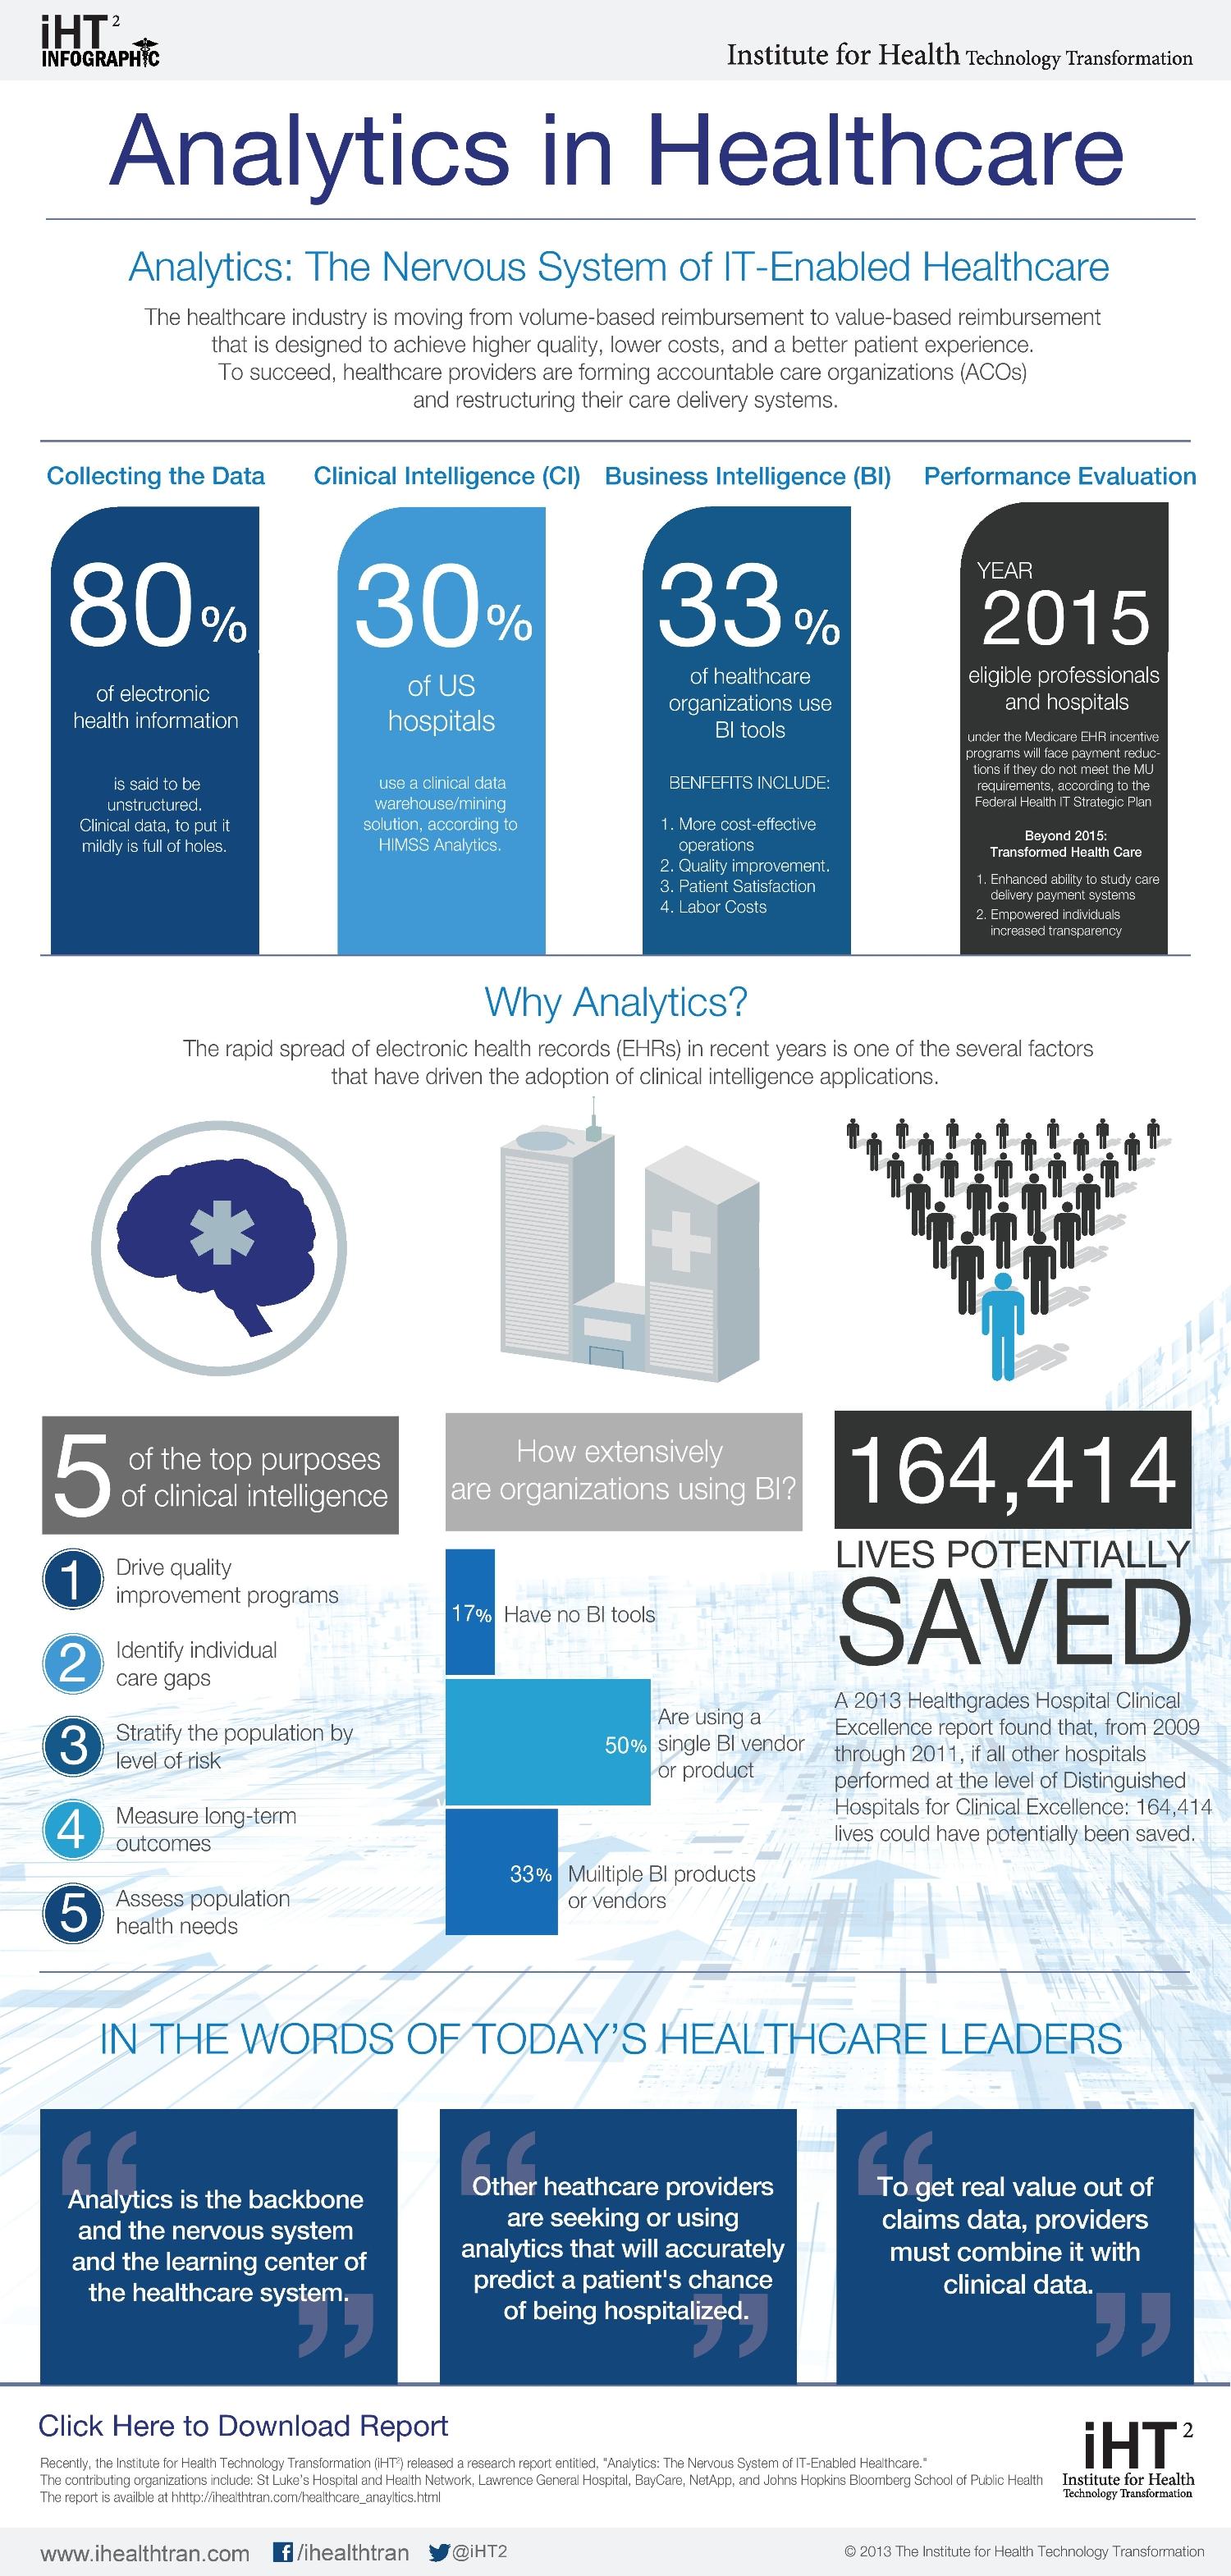 MSIT: Business Intelligence & Data Analytics (BIDA)